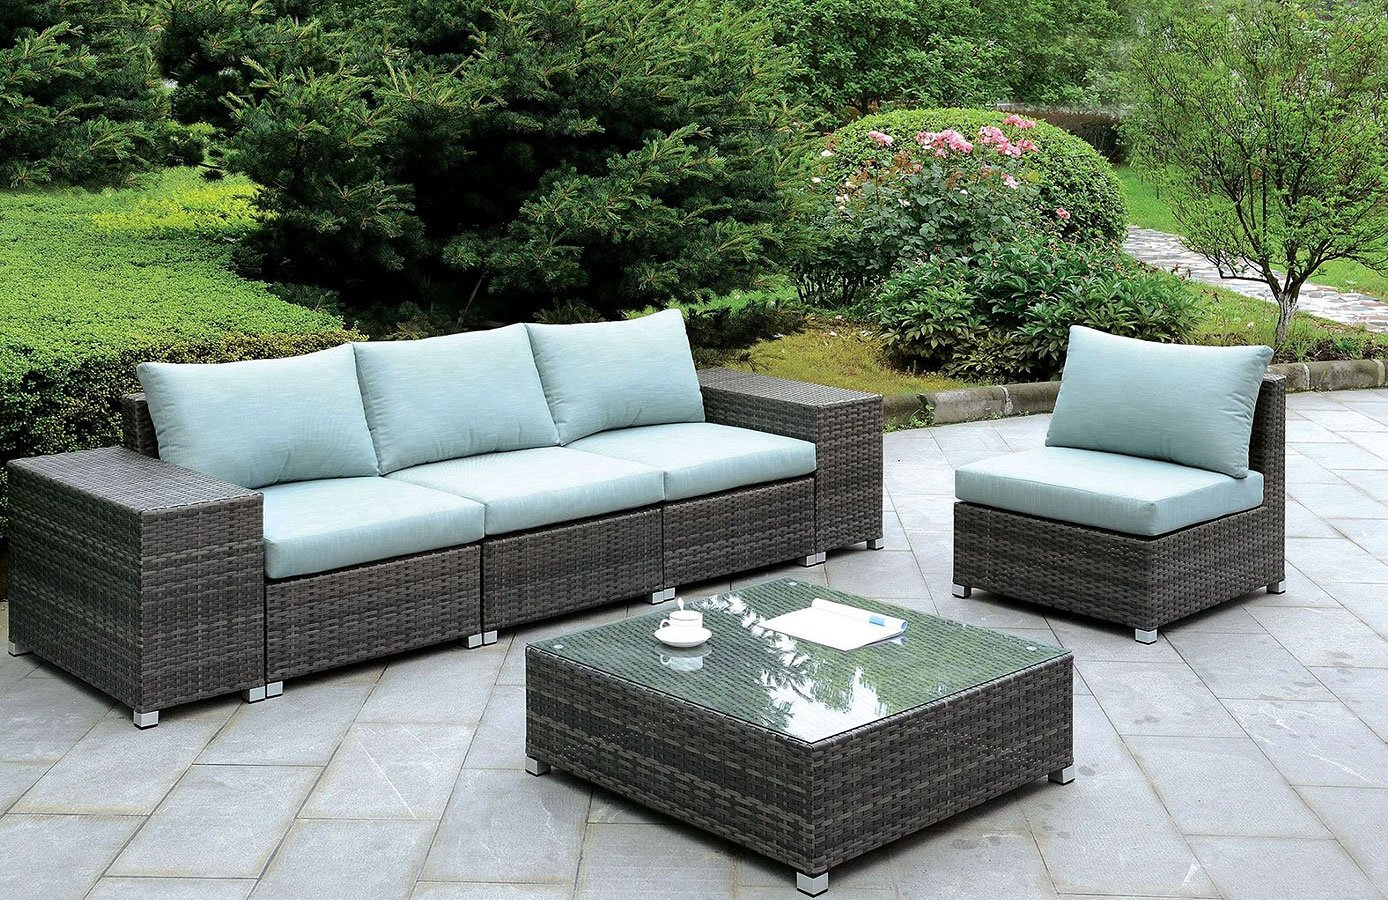 Morgana Outdoor Modular Seating Set - Morgana Outdoor Modular Seating Set - Outdoor Furniture - Outdoor